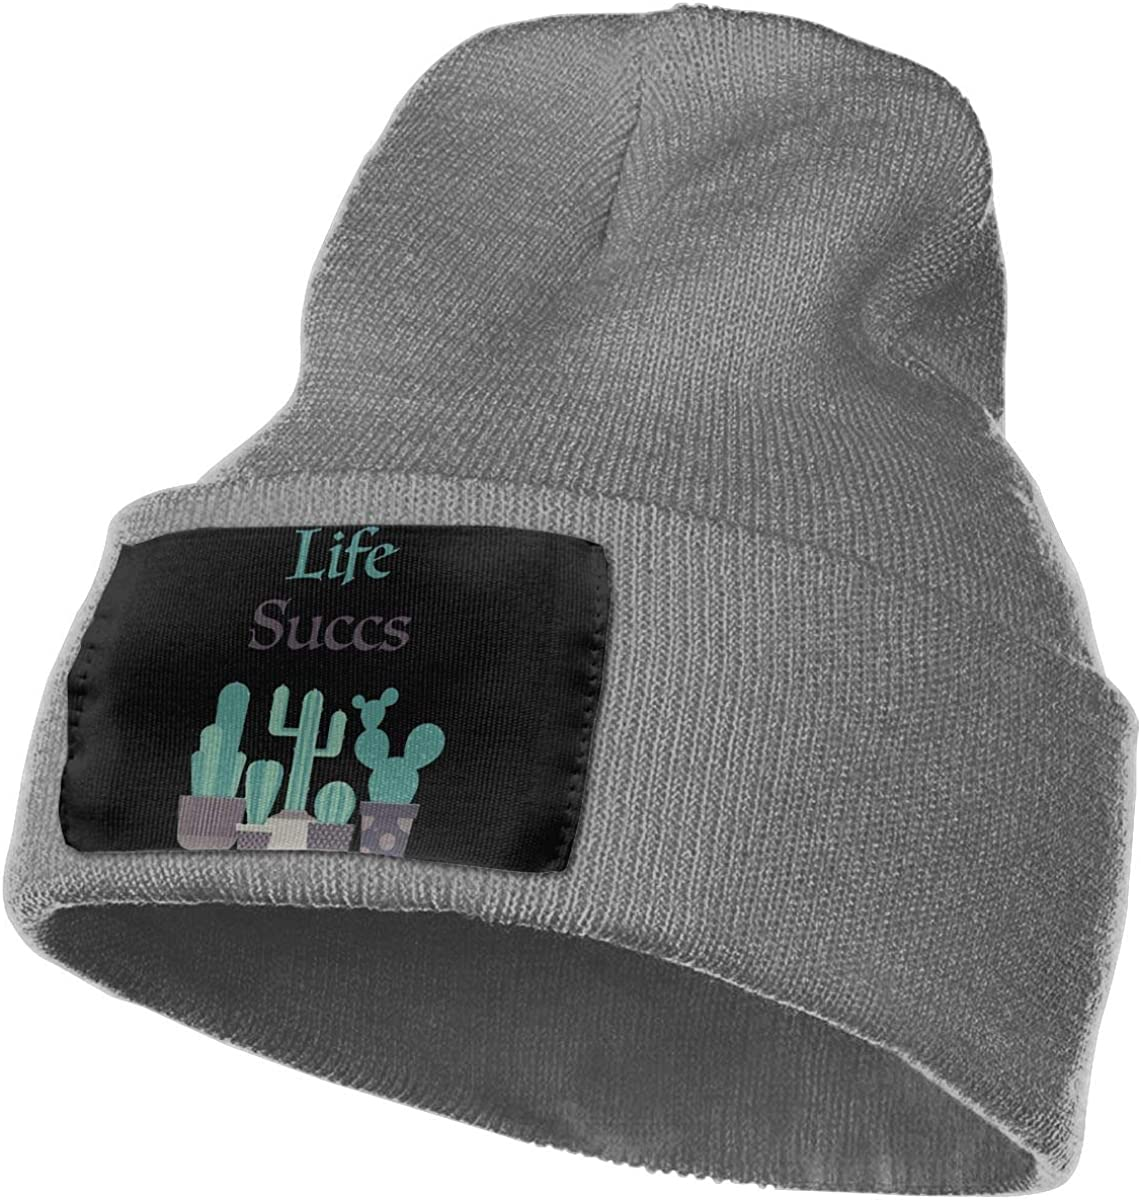 Life Succs Men /& Women Knitting Hats Stretchy /& Soft Beanie Cap Hat Beanie